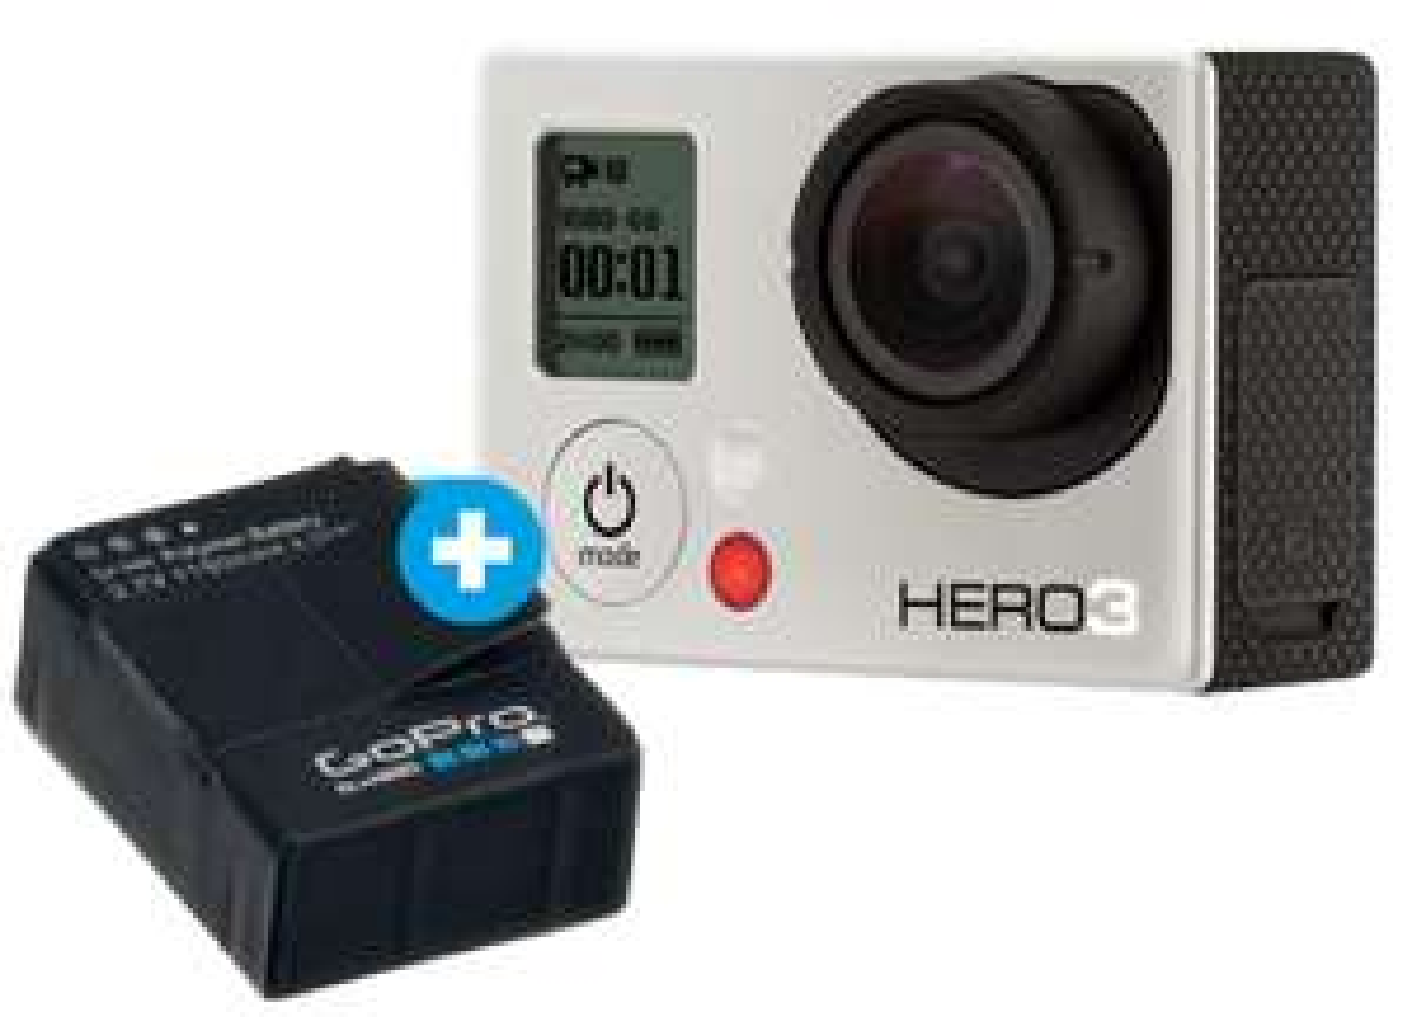 Camera GoPro Hero 3 Slim - Blanche